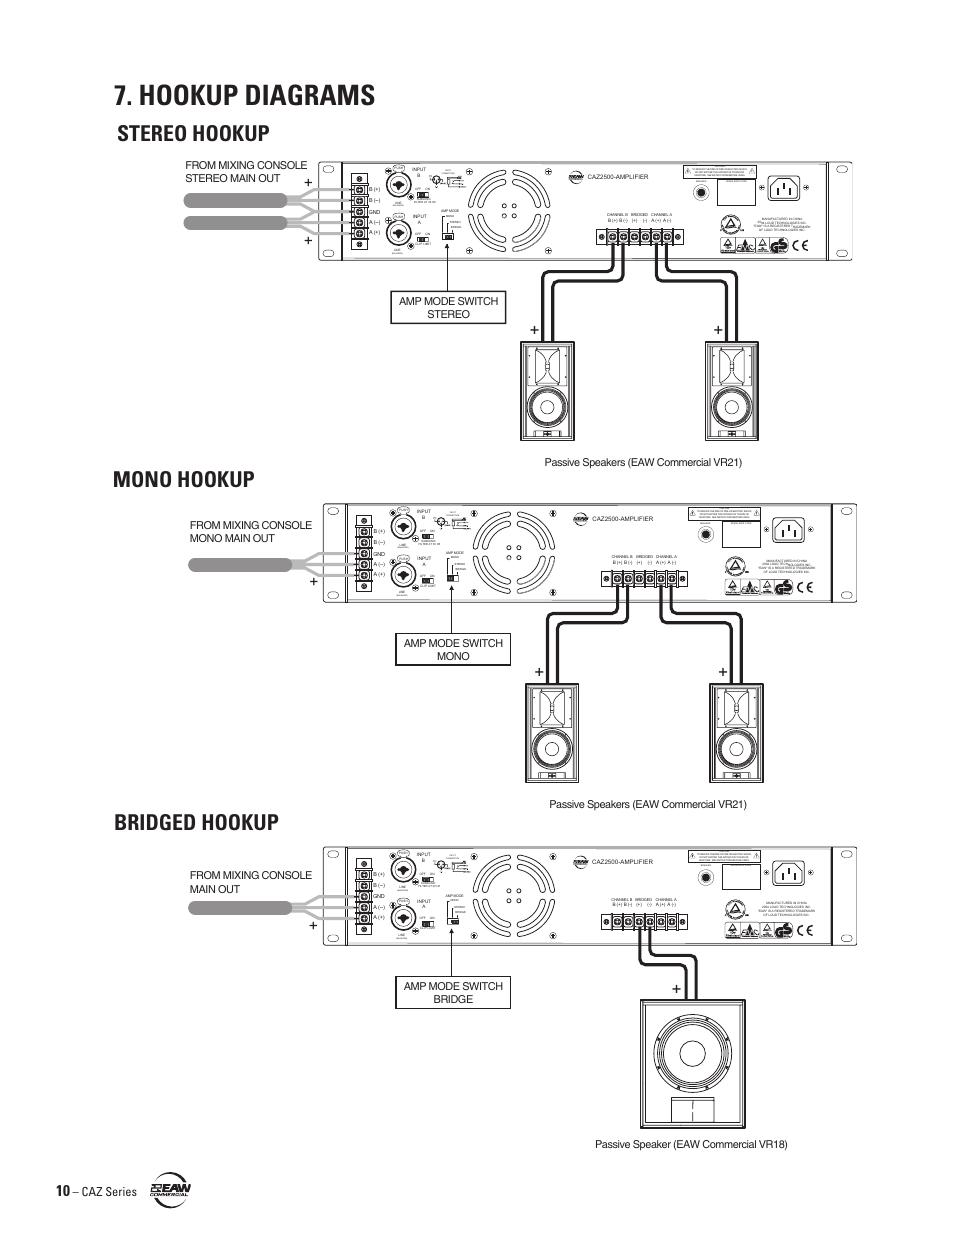 hight resolution of hookup diagrams stereo hookup mono hookup bridged hookup balanced eaw caz2500 user manual page 10 16